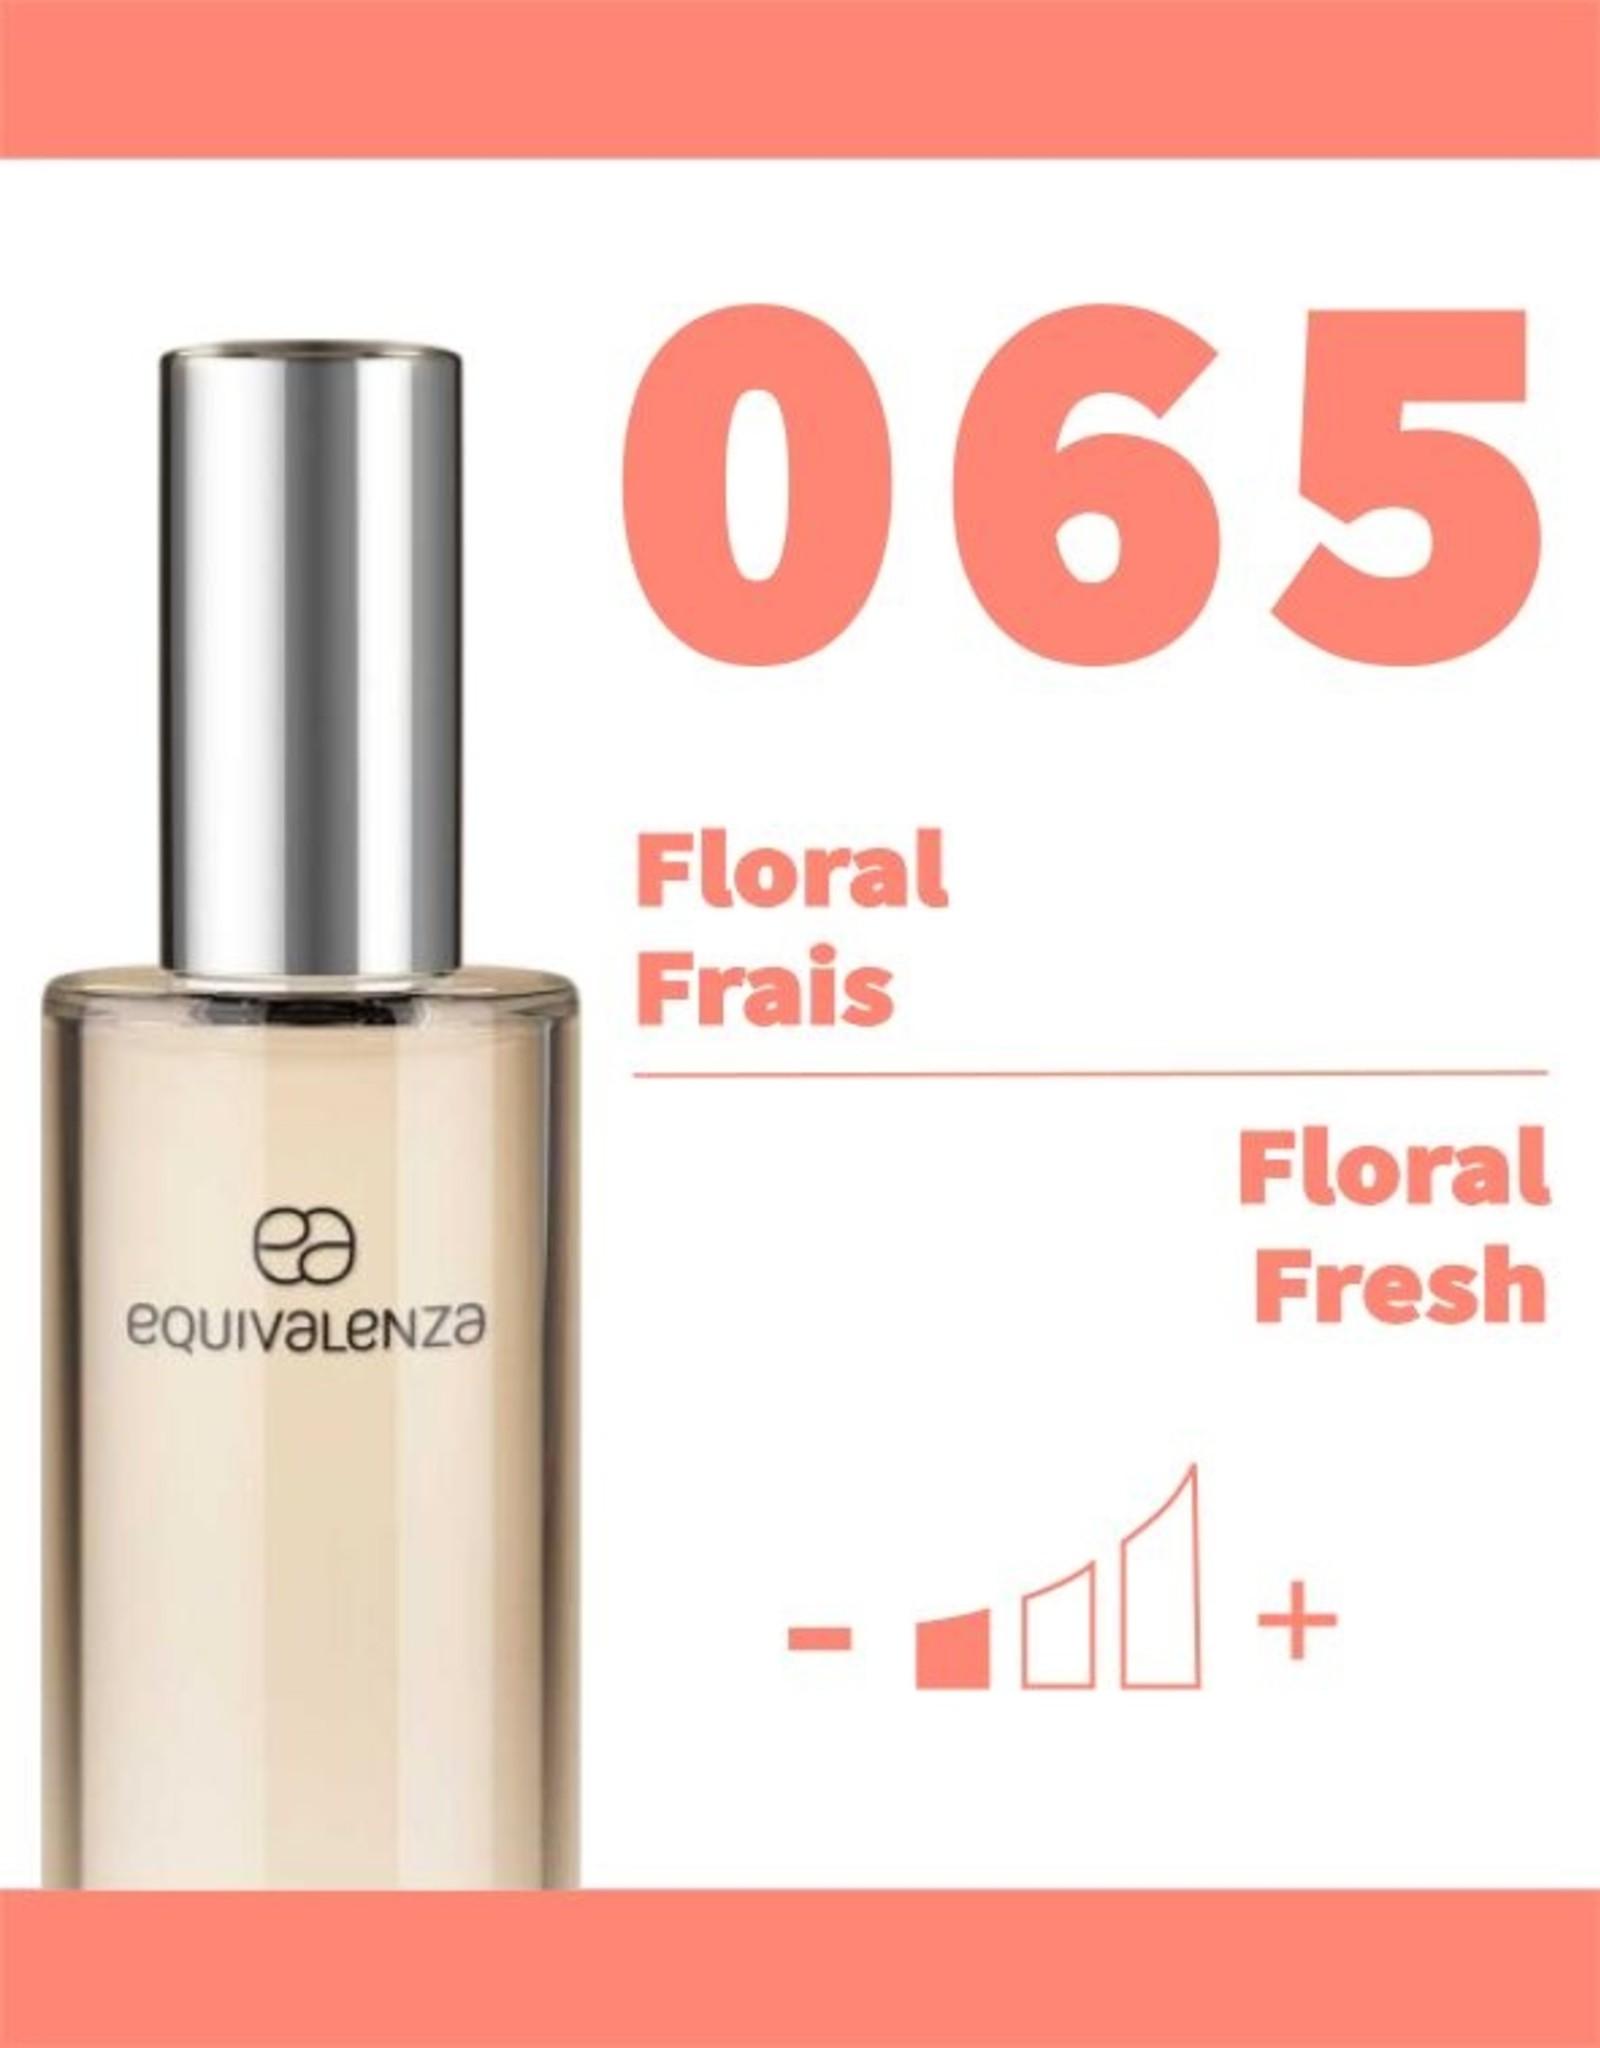 Equivalenza Floral Fresh 065